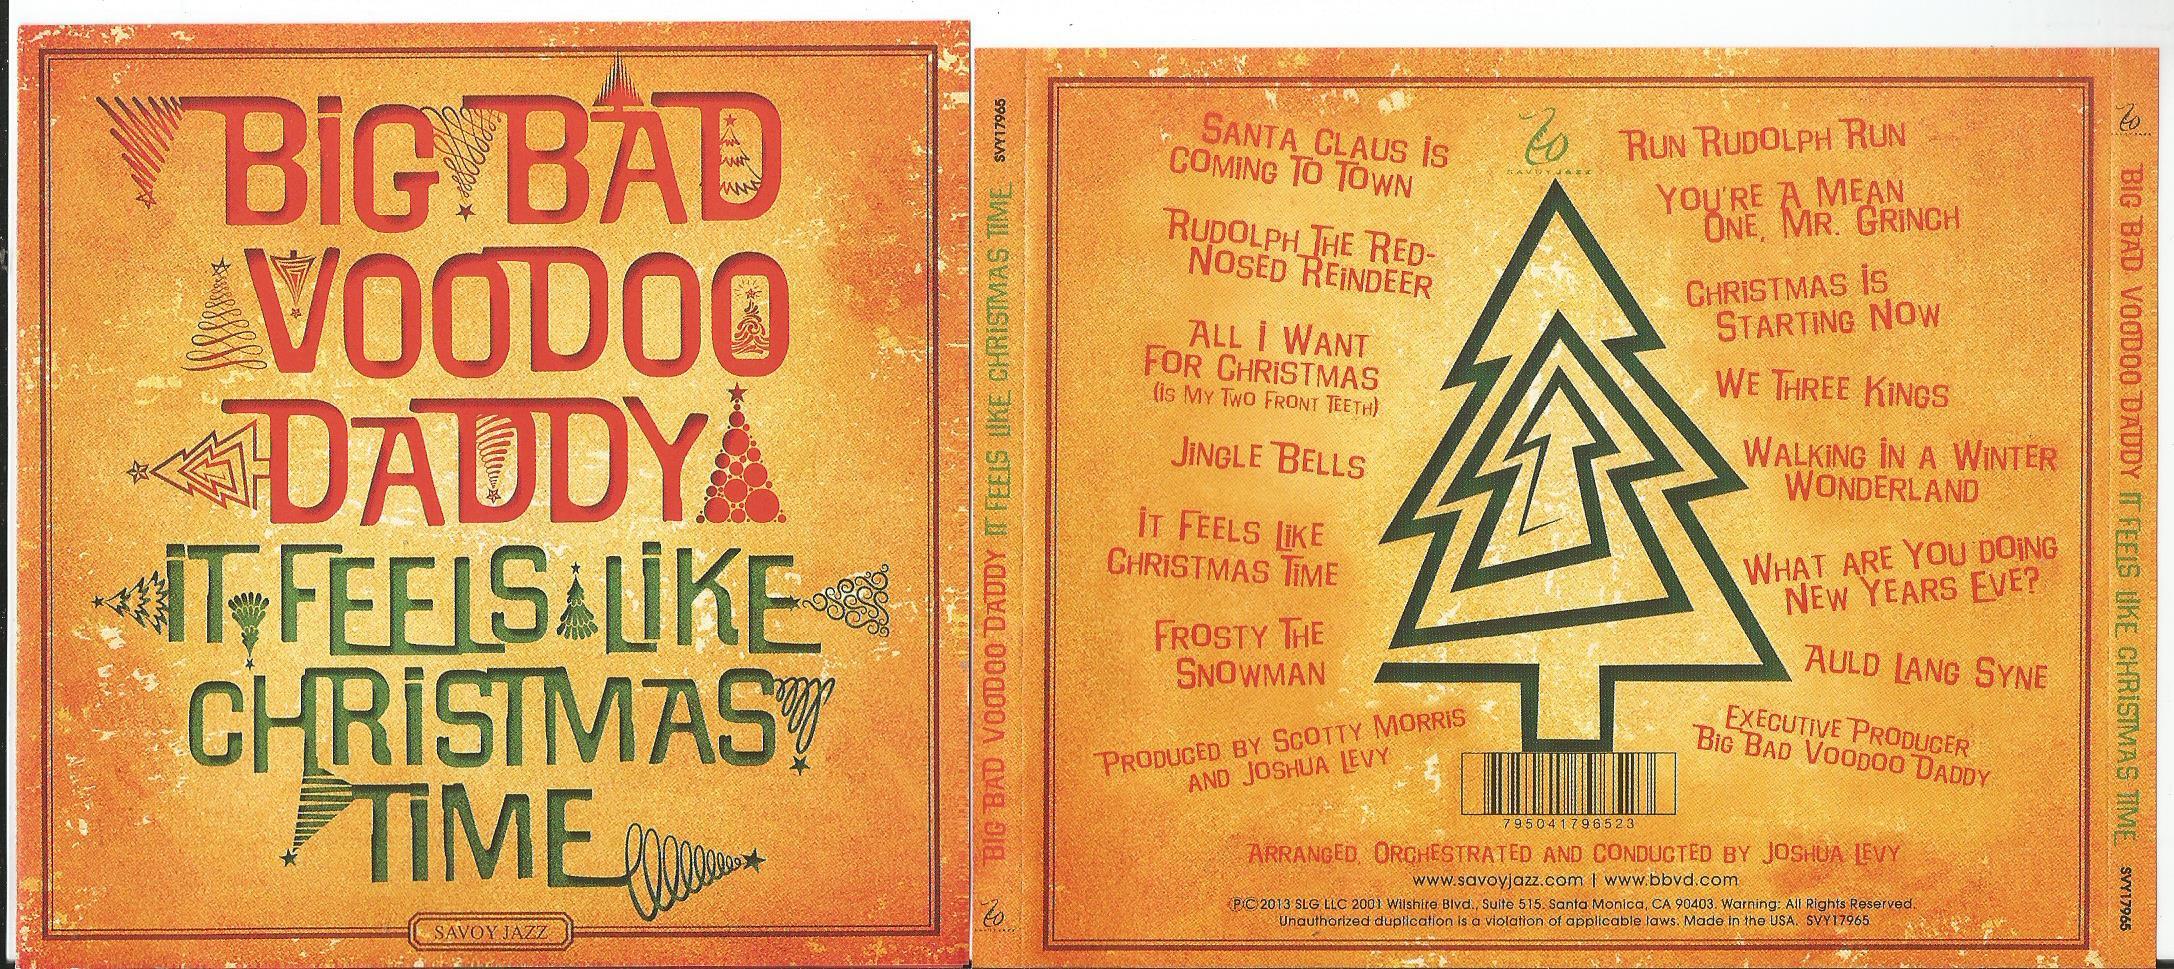 Big Bad Voodoo Daddy It Feels Like Christmas Time